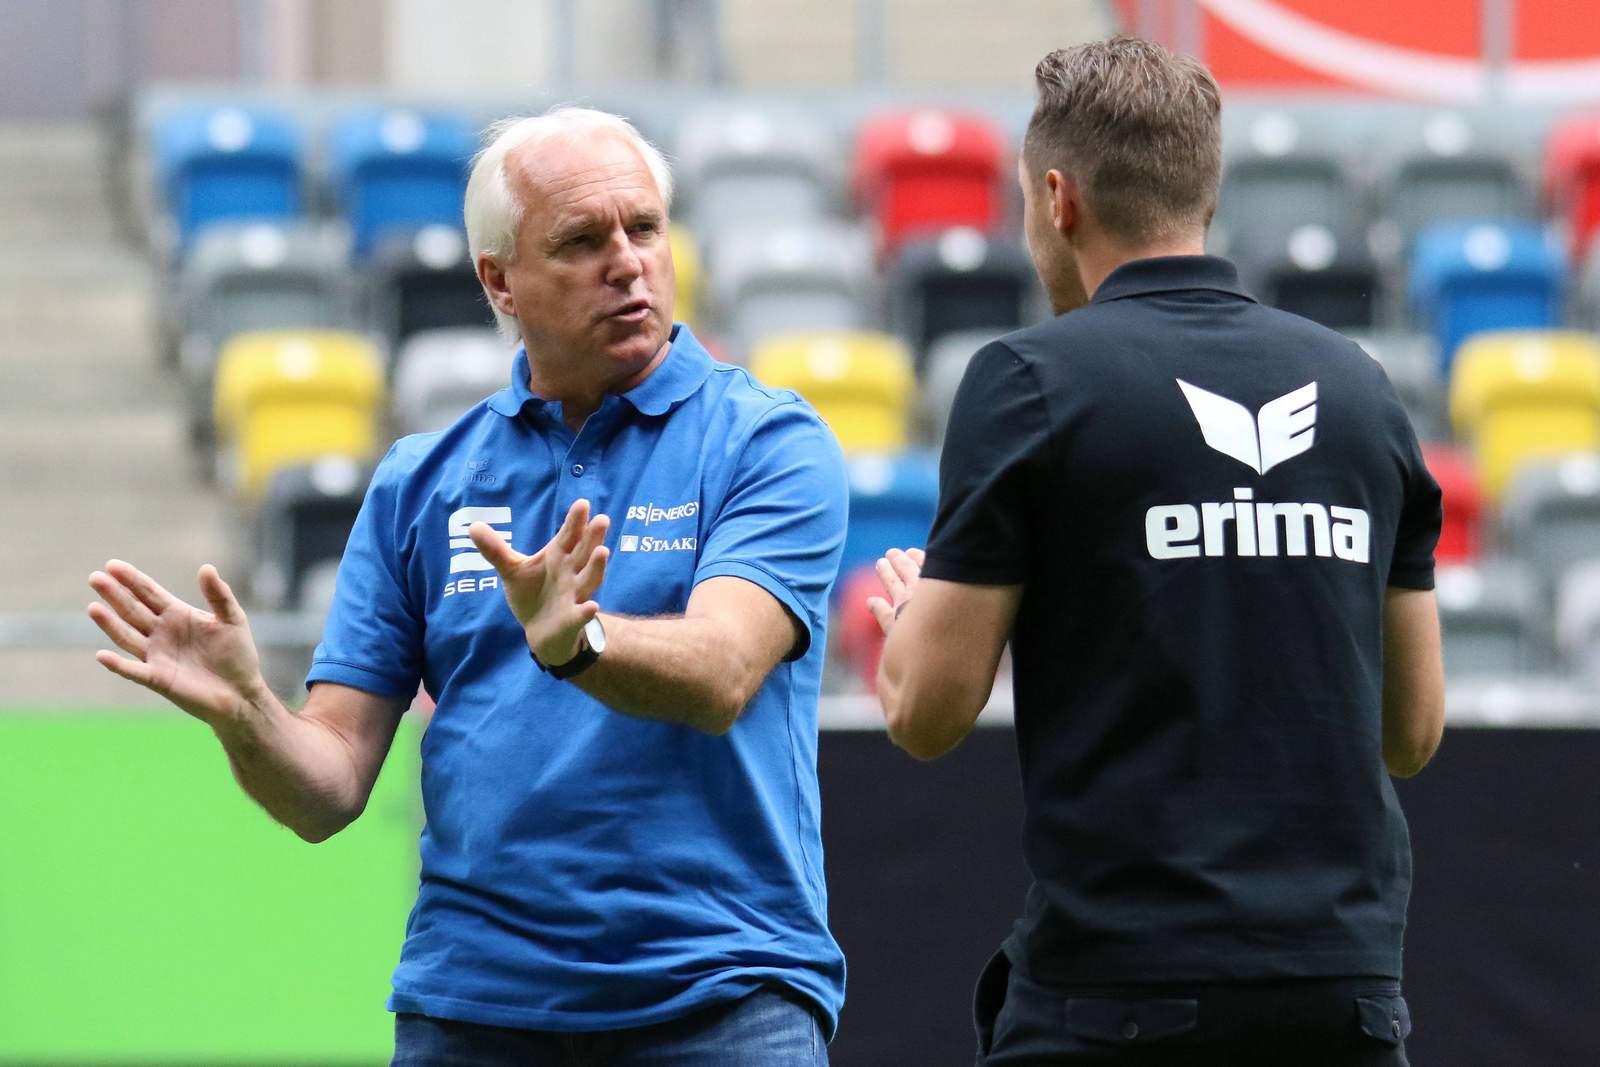 Peter Vollmann vor dem Spiel gegen Uerdingen.